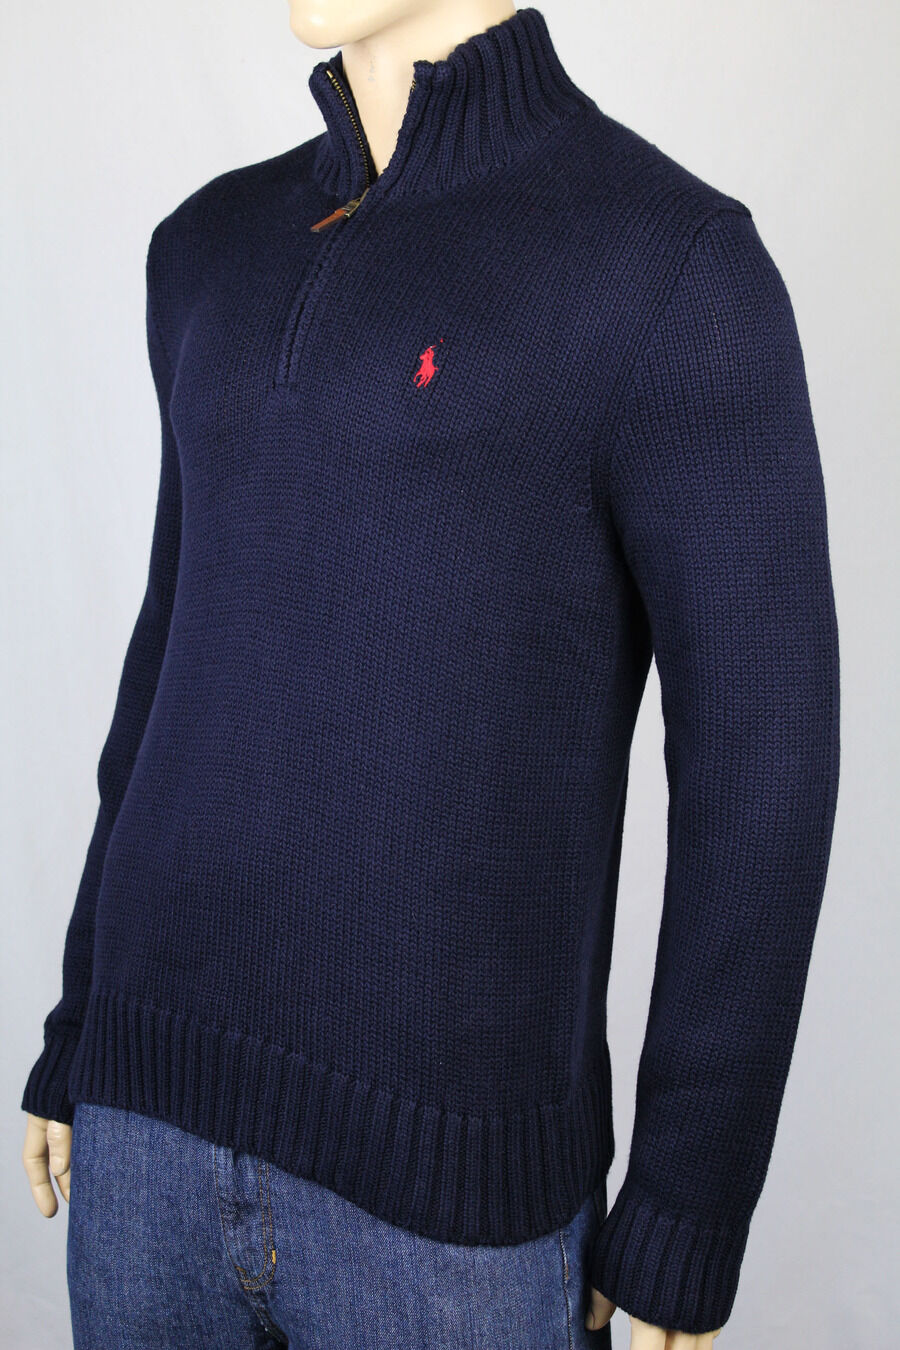 Polo Ralph Lauren X-Large XL Navy Blau 1/2 Half Zip Sweater ROT Pony NWT